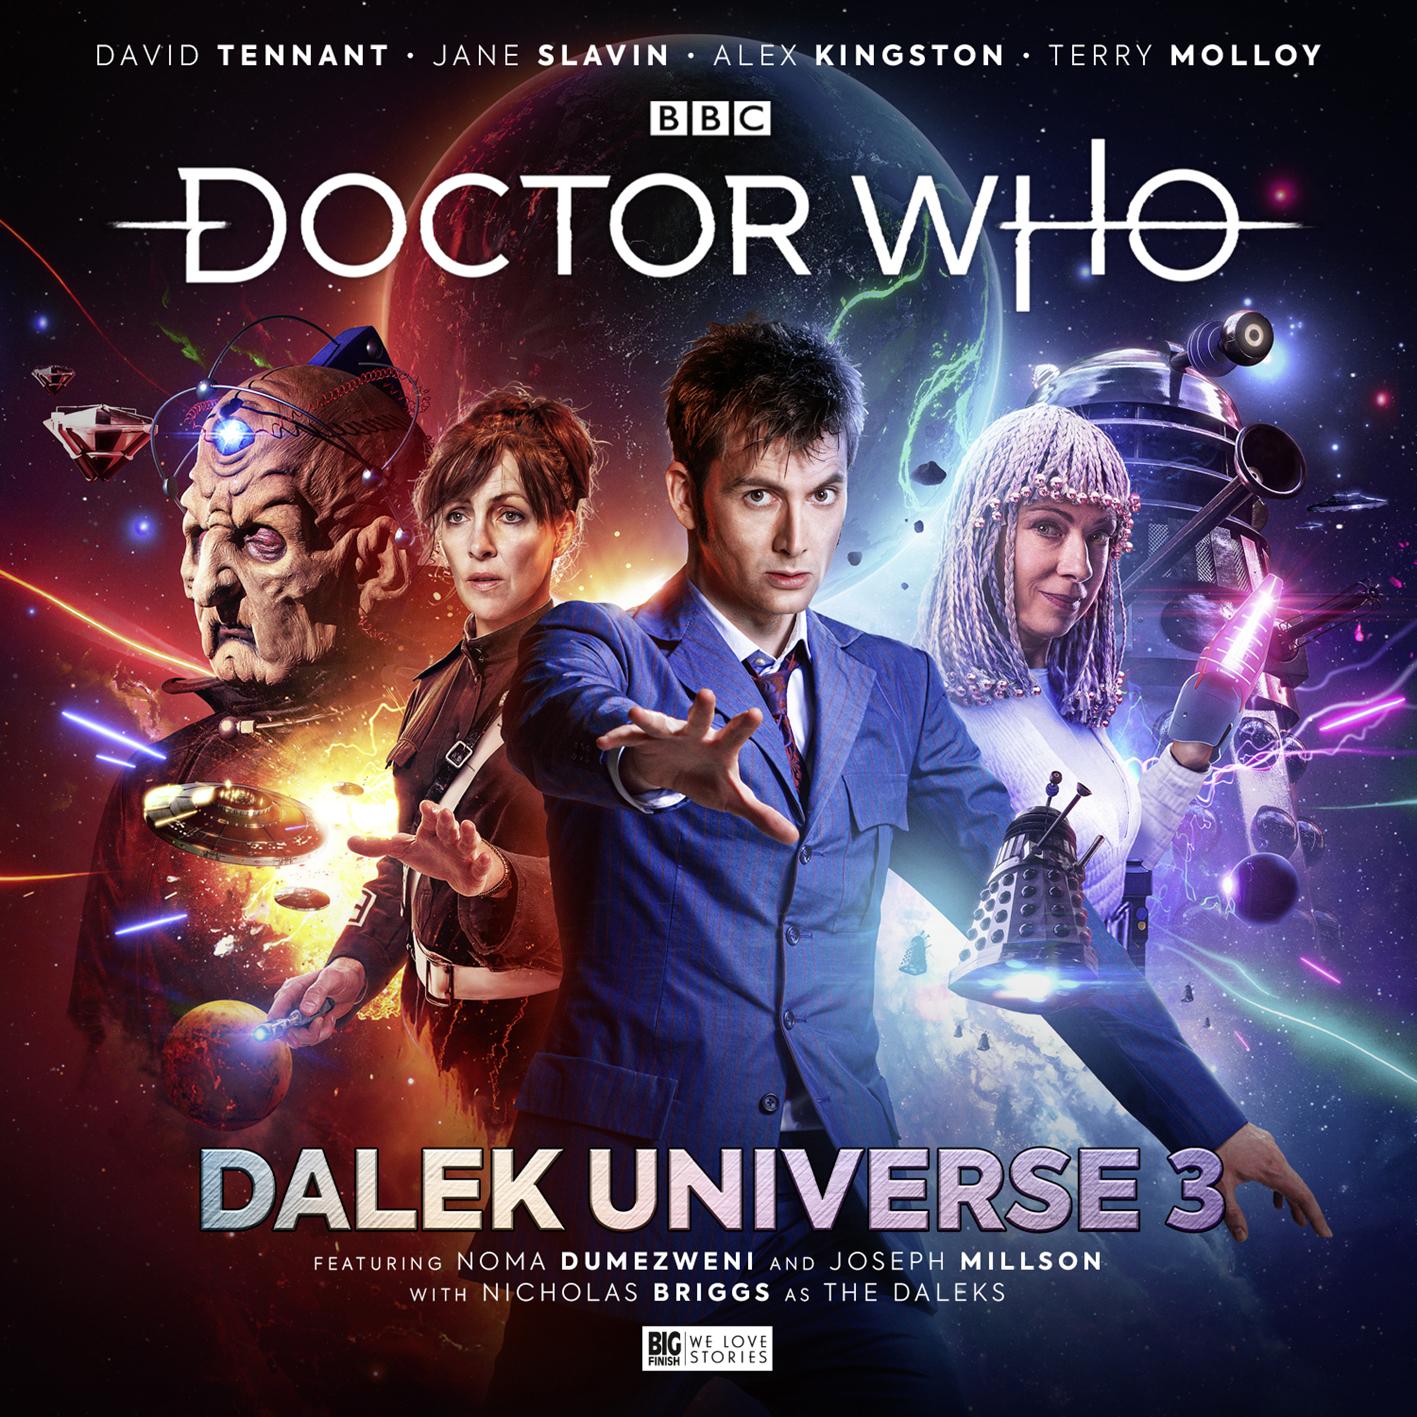 Doctor Who: Dalek Universe 3. Cover by Simon Holub (c) Big Finish Productions Tenth Doctor Davros Anya Kingdom River Song Movellan David Tennant